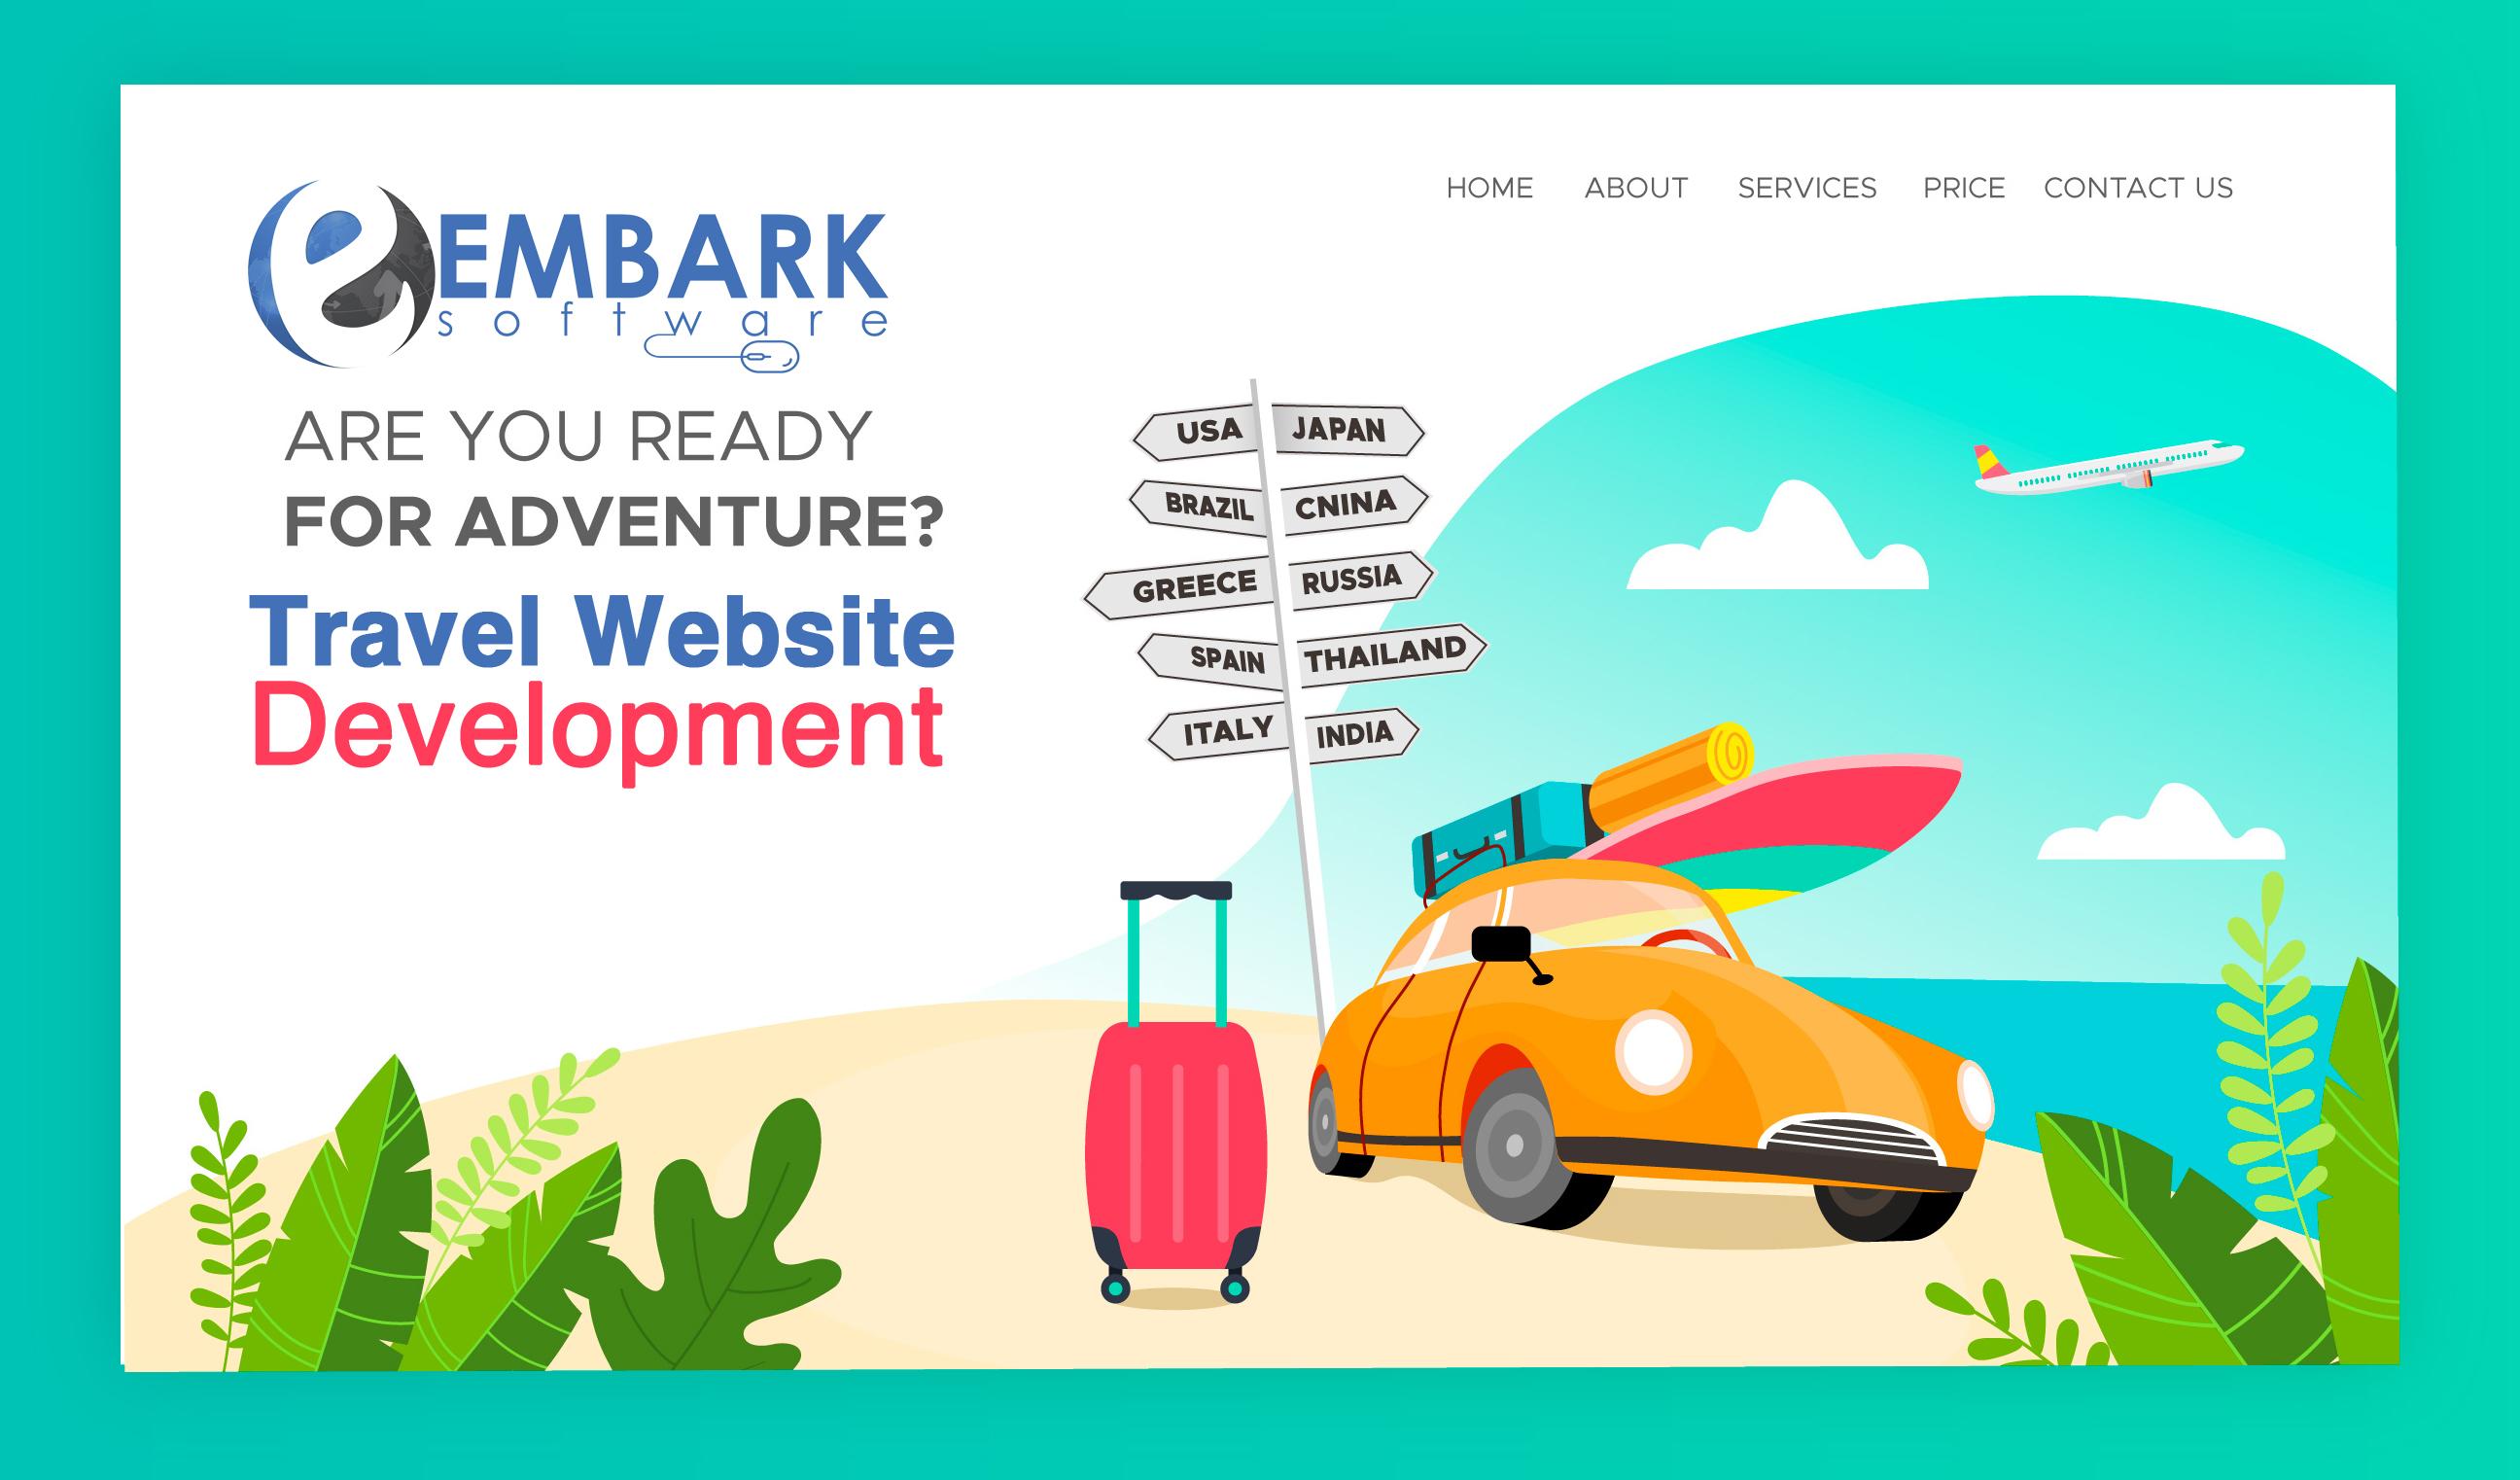 Main Motive of the Travel Website Development